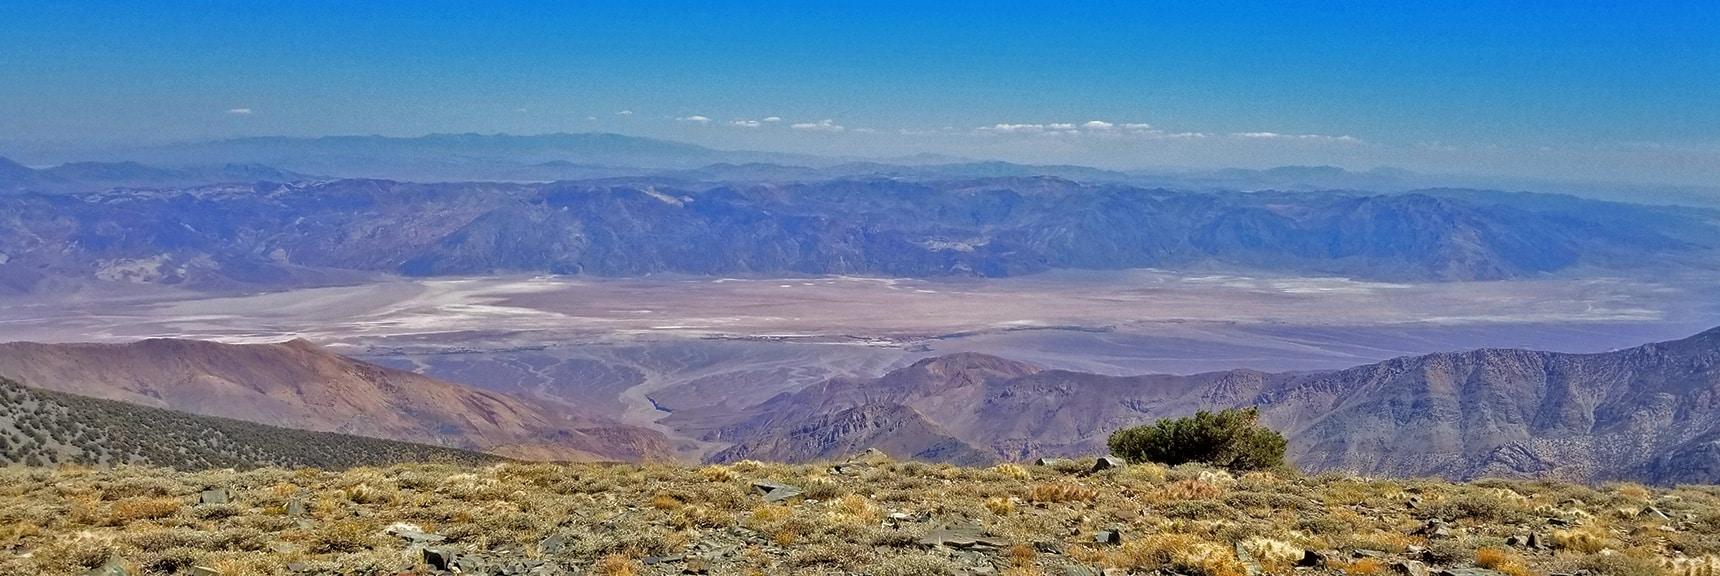 Death Valley Floor, Funeral Mountains and Mt. Charleston Wilderness from Bennett Peak Summit   Telescope Peak Summit from Wildrose Charcoal Kilns Parking Area, Panamint Mountains, Death Valley National Park, California